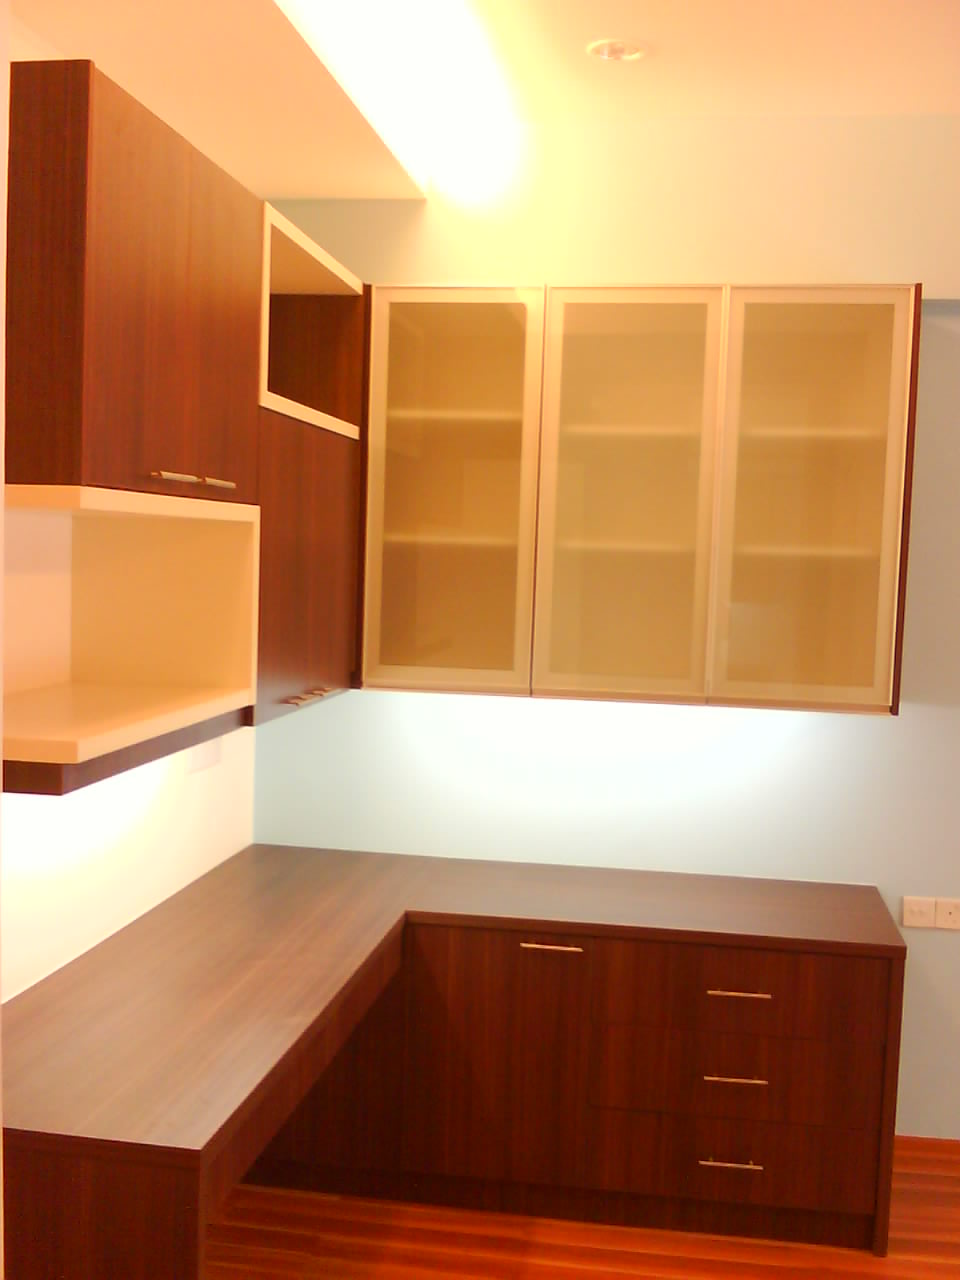 cupboard designs study room photo - 2